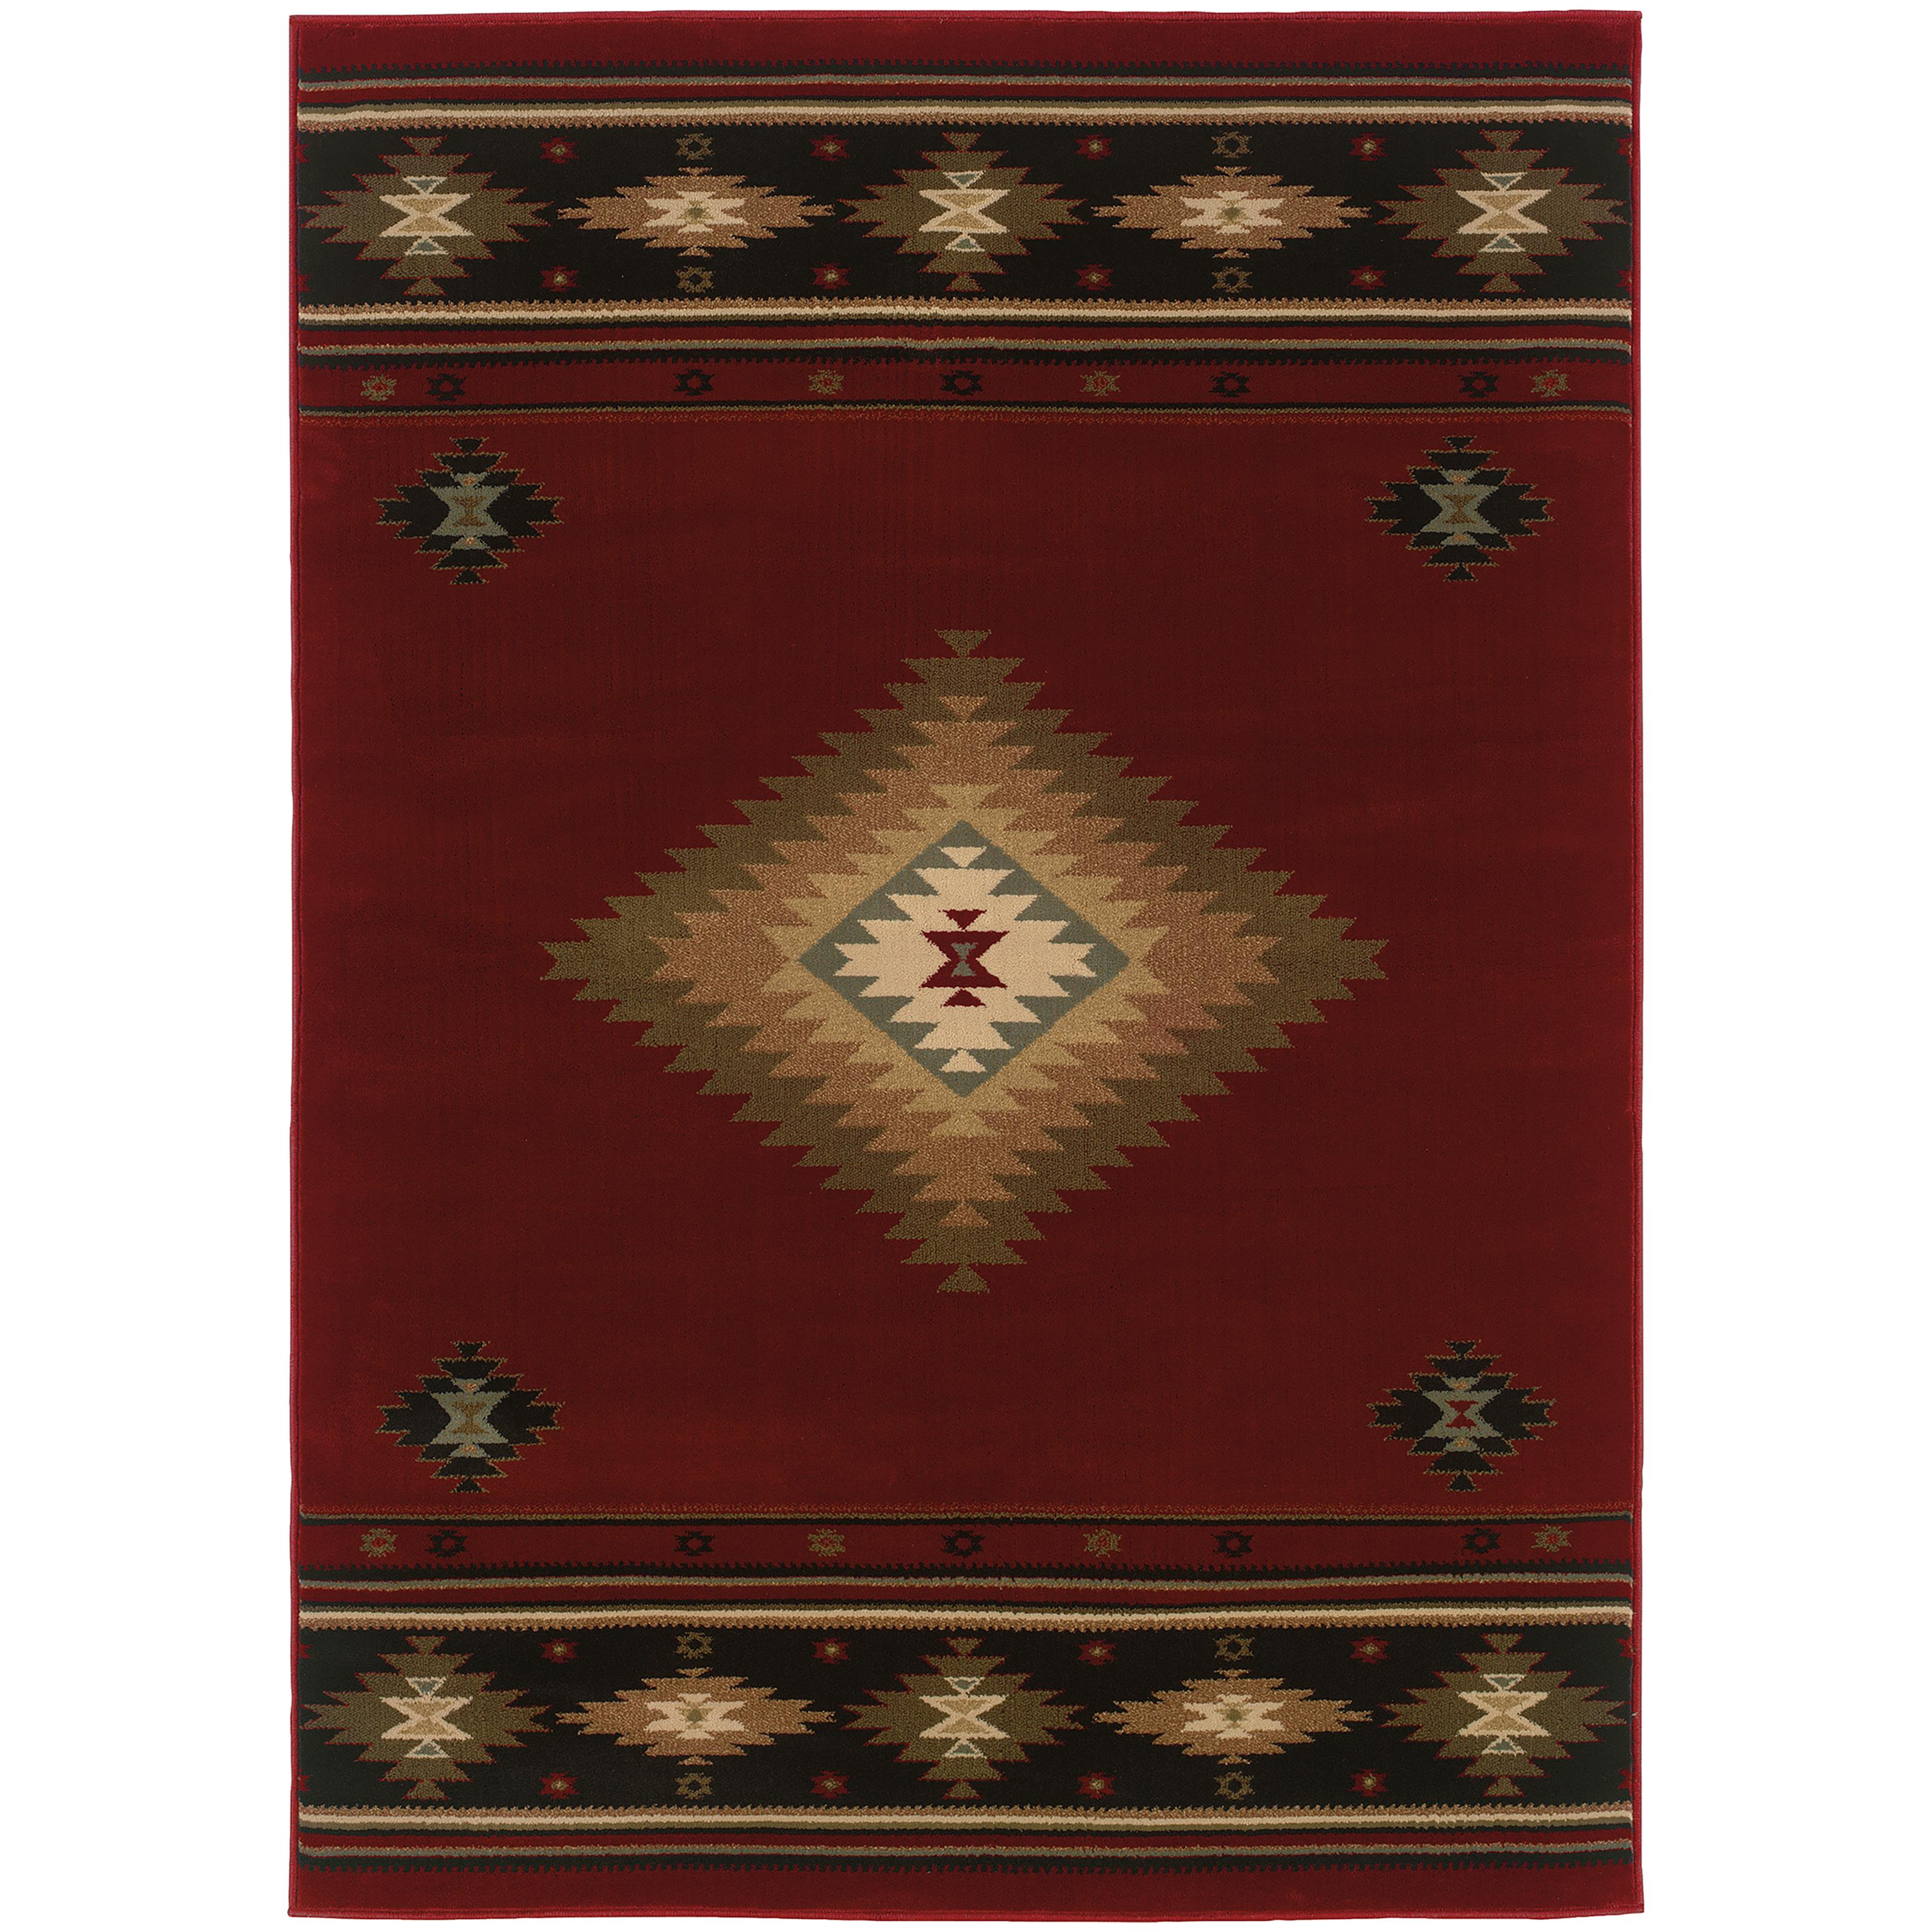 Oriental Weavers Hudson 10' X 13' Rug - Item Number: H087K1305396ST